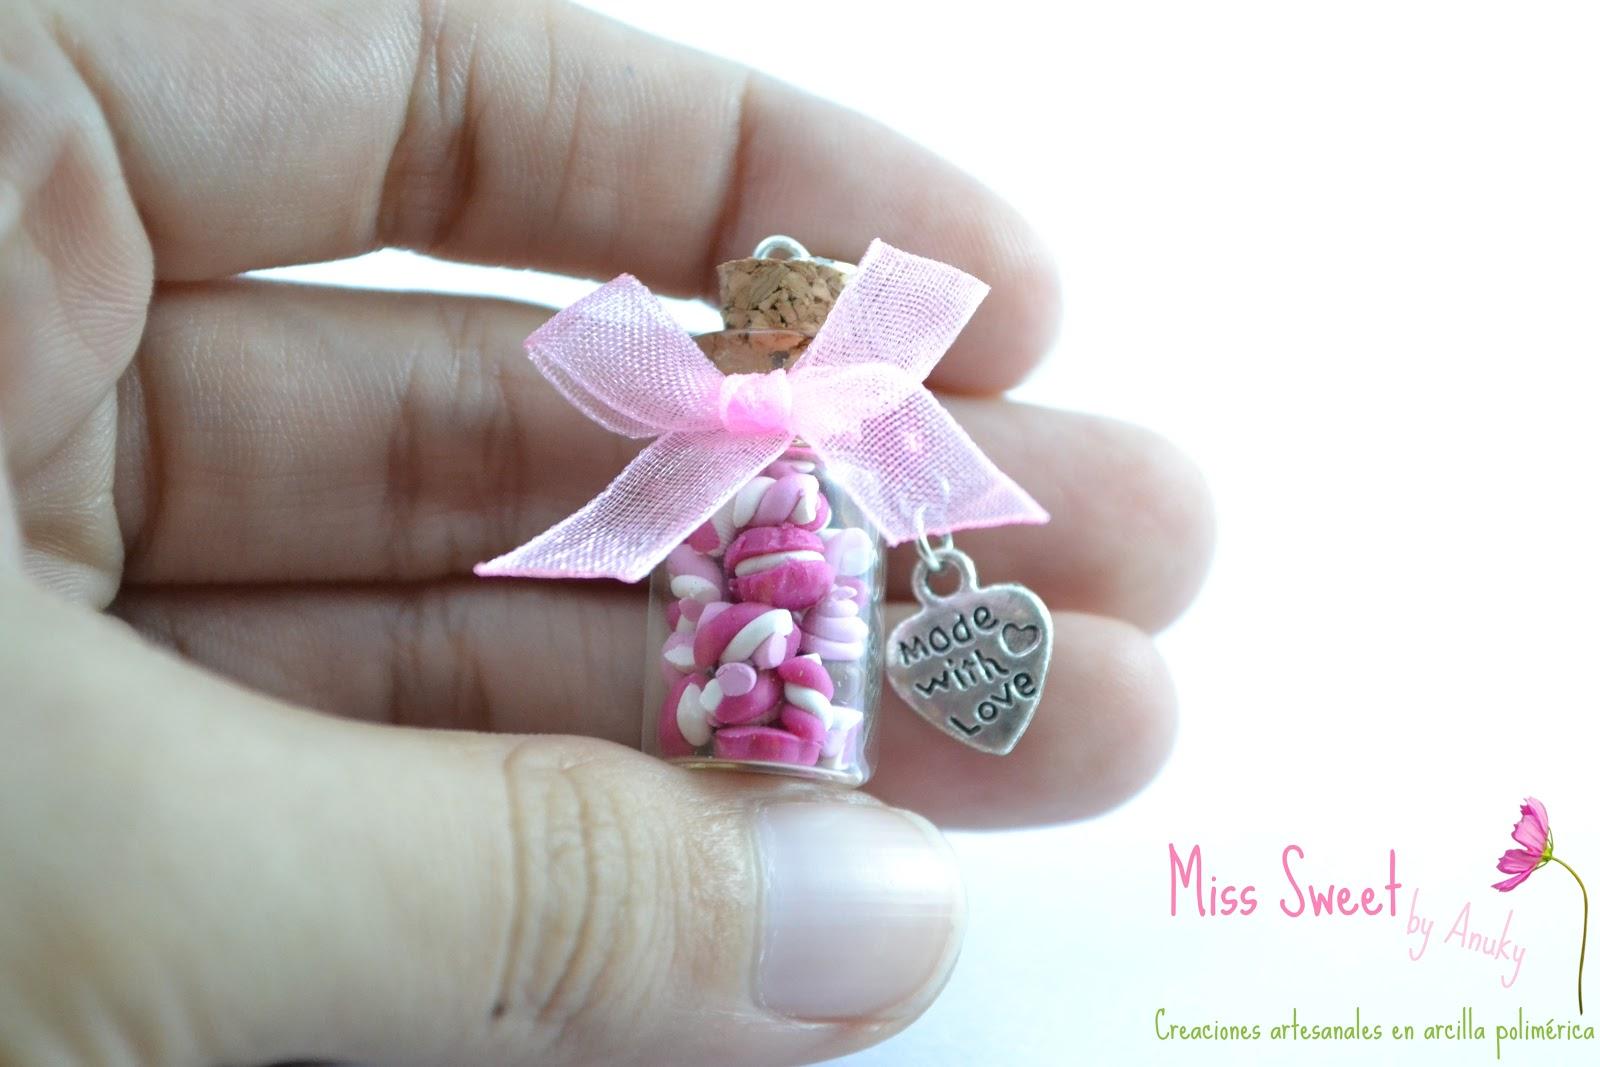 Conociendo_a_Miss_Sweet_The_Pink_Graff_05